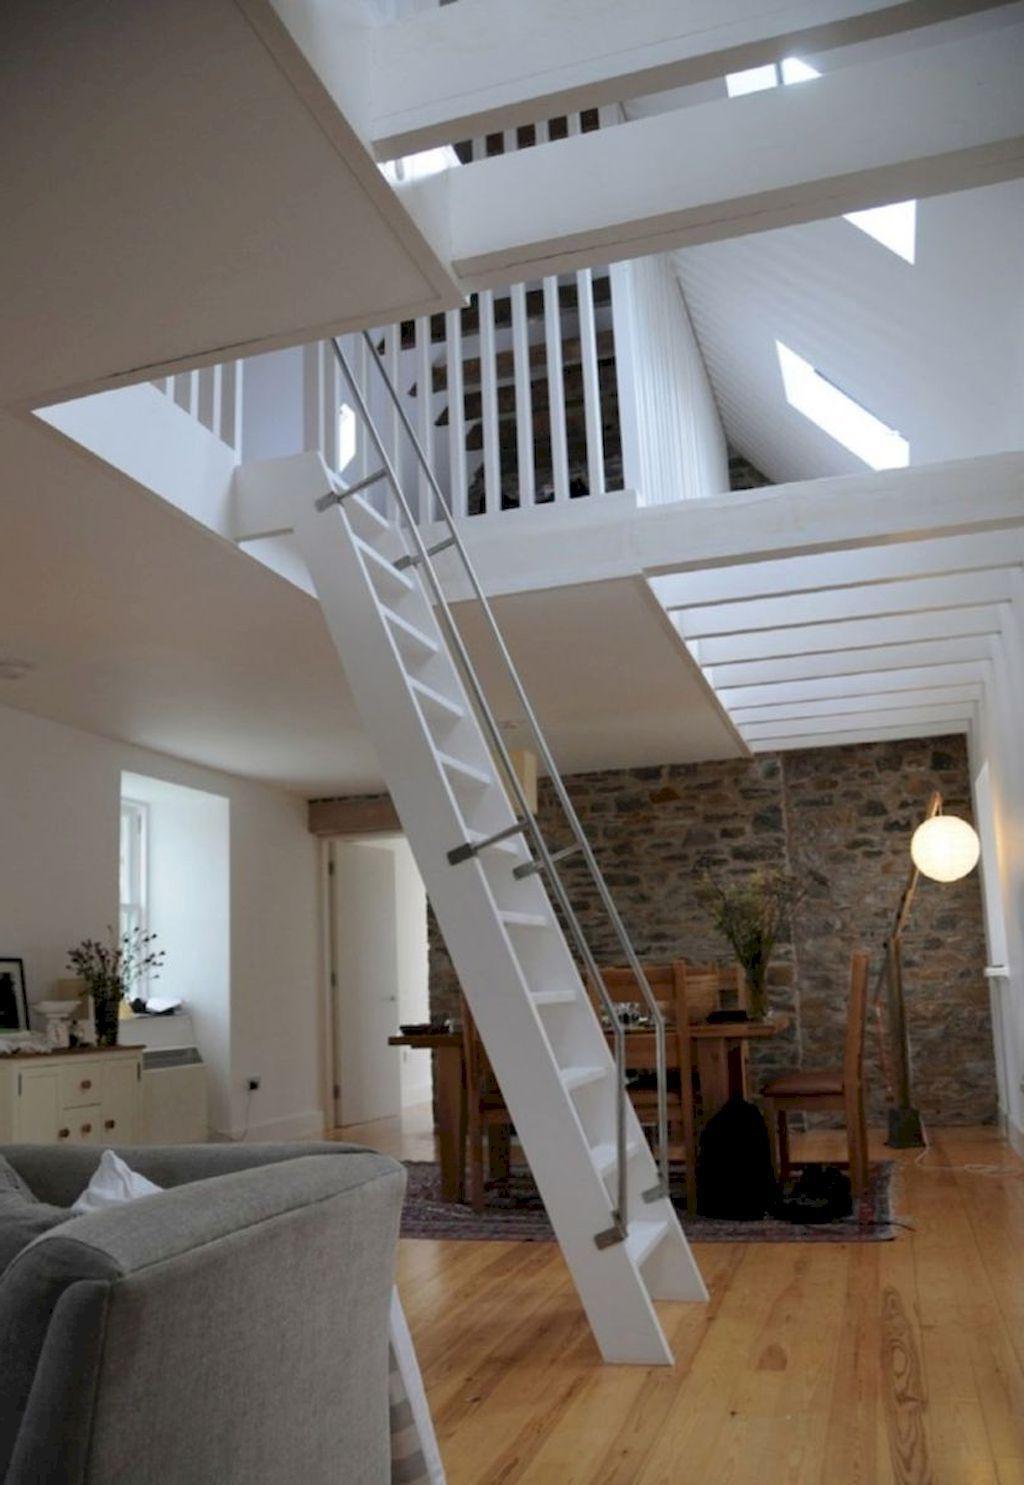 35 Amazing Loft Stair For Tiny House Ideas Tiny House